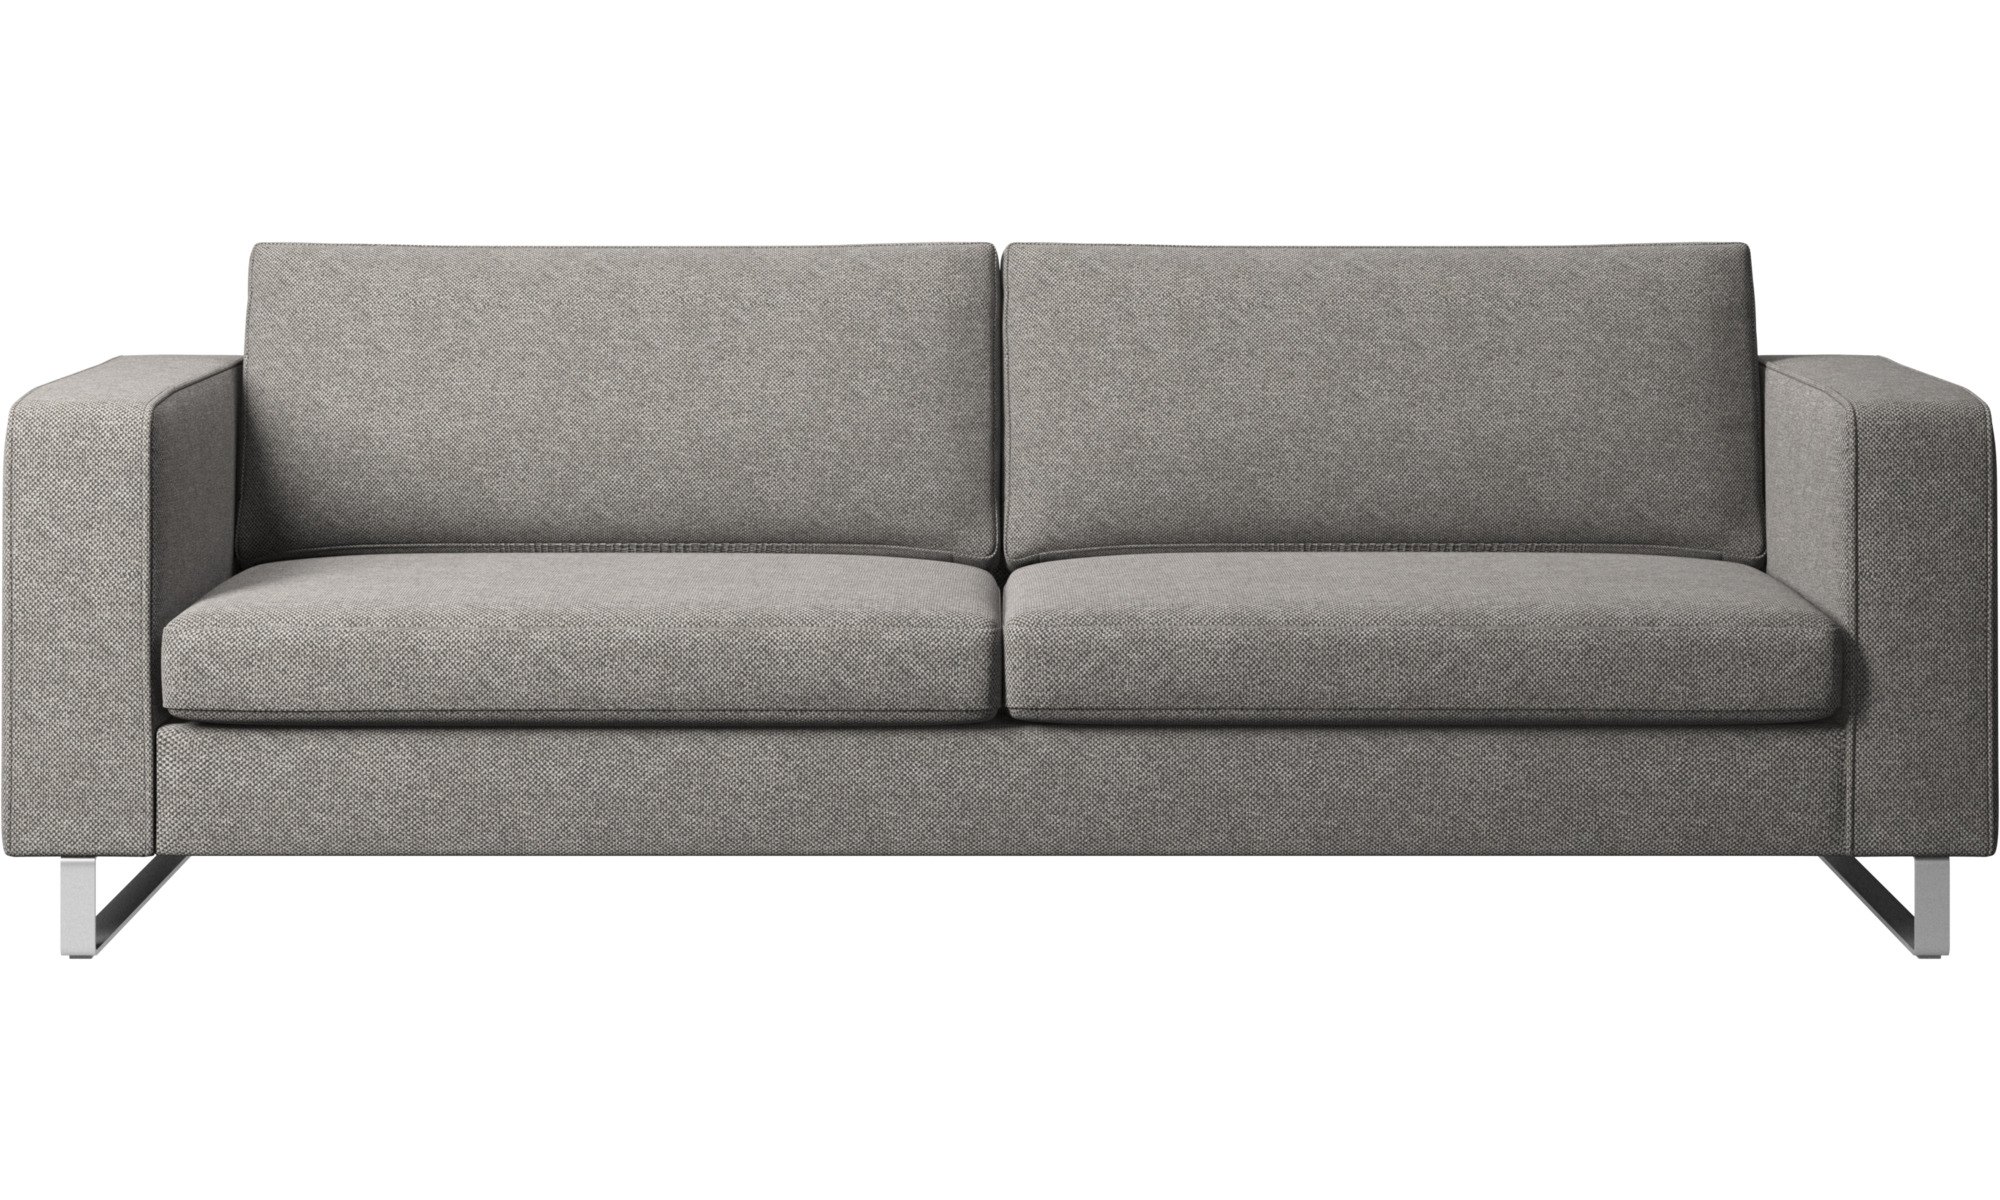 canap s 3 places canap indivi 2 boconcept. Black Bedroom Furniture Sets. Home Design Ideas